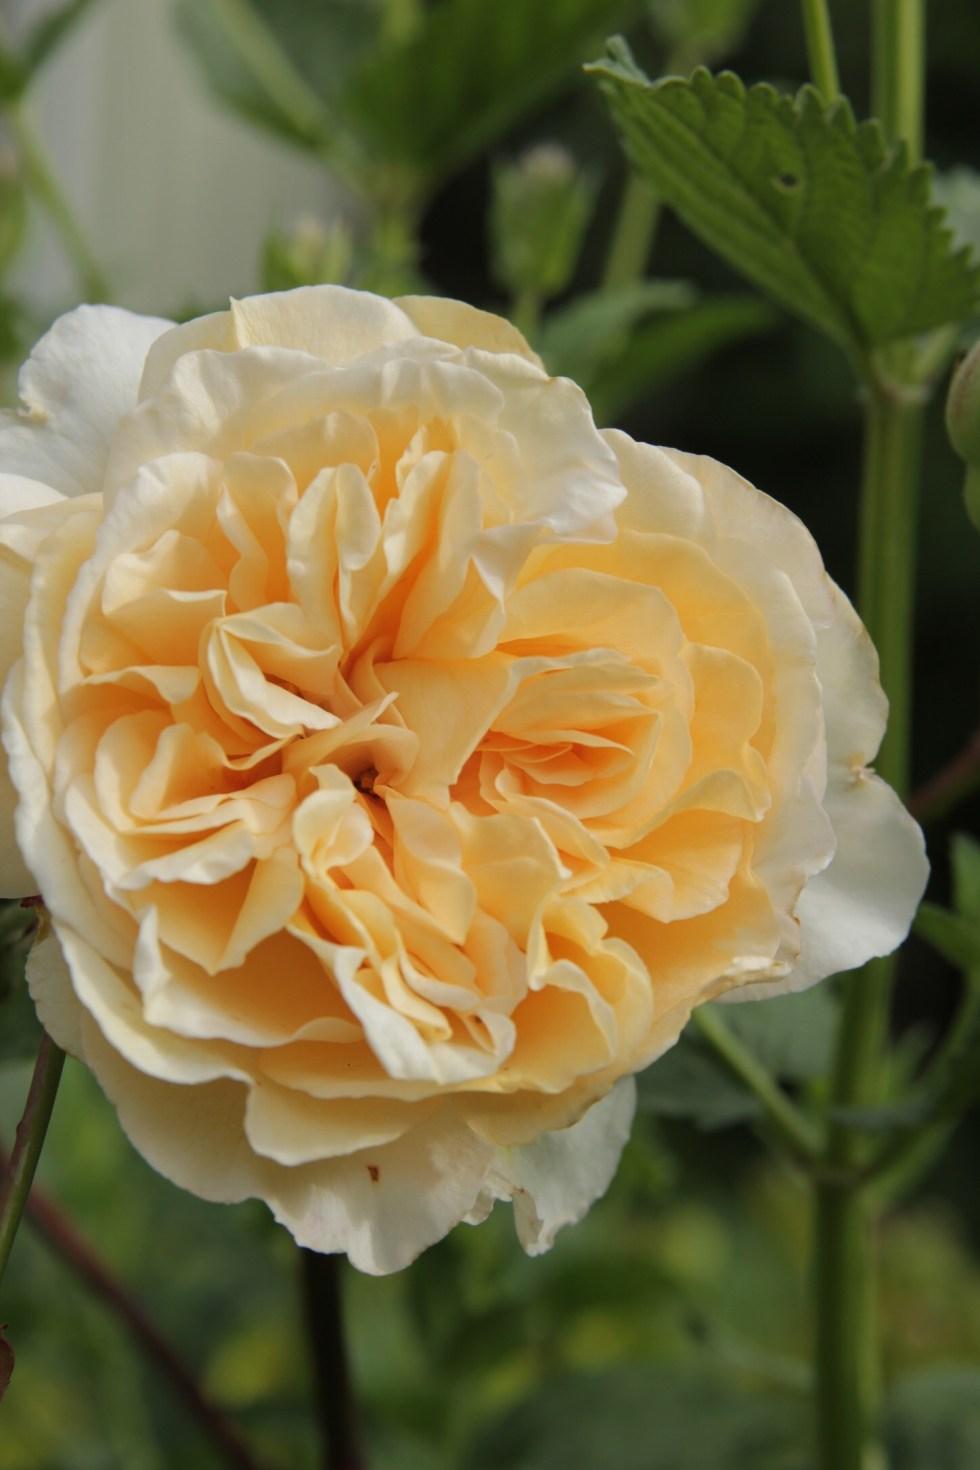 rosa buff beauty 2 Rose of the week  Buff beauty